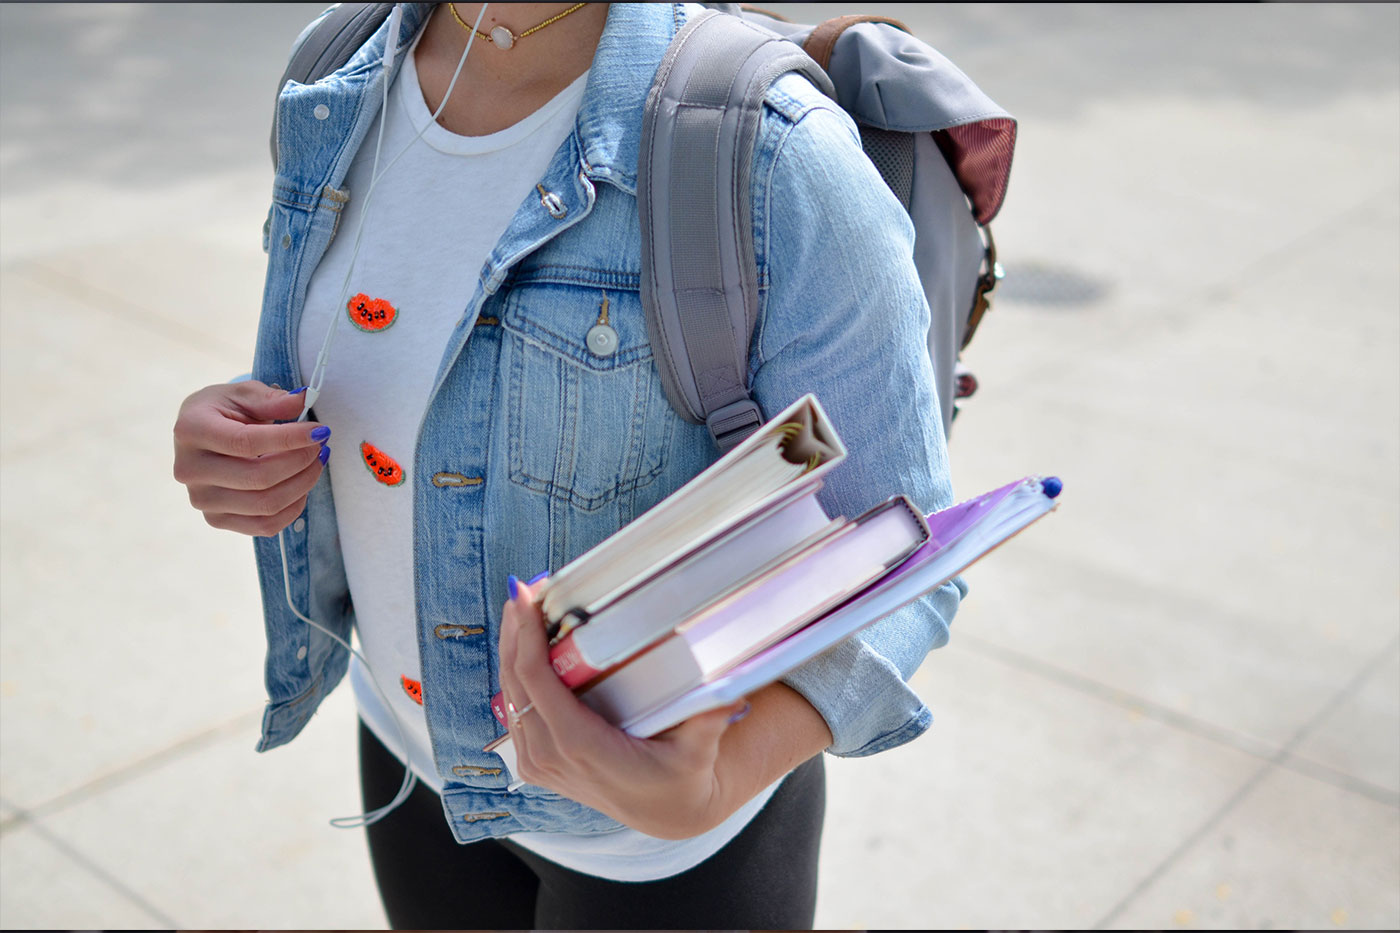 Ethnic Studies in California's High Schools